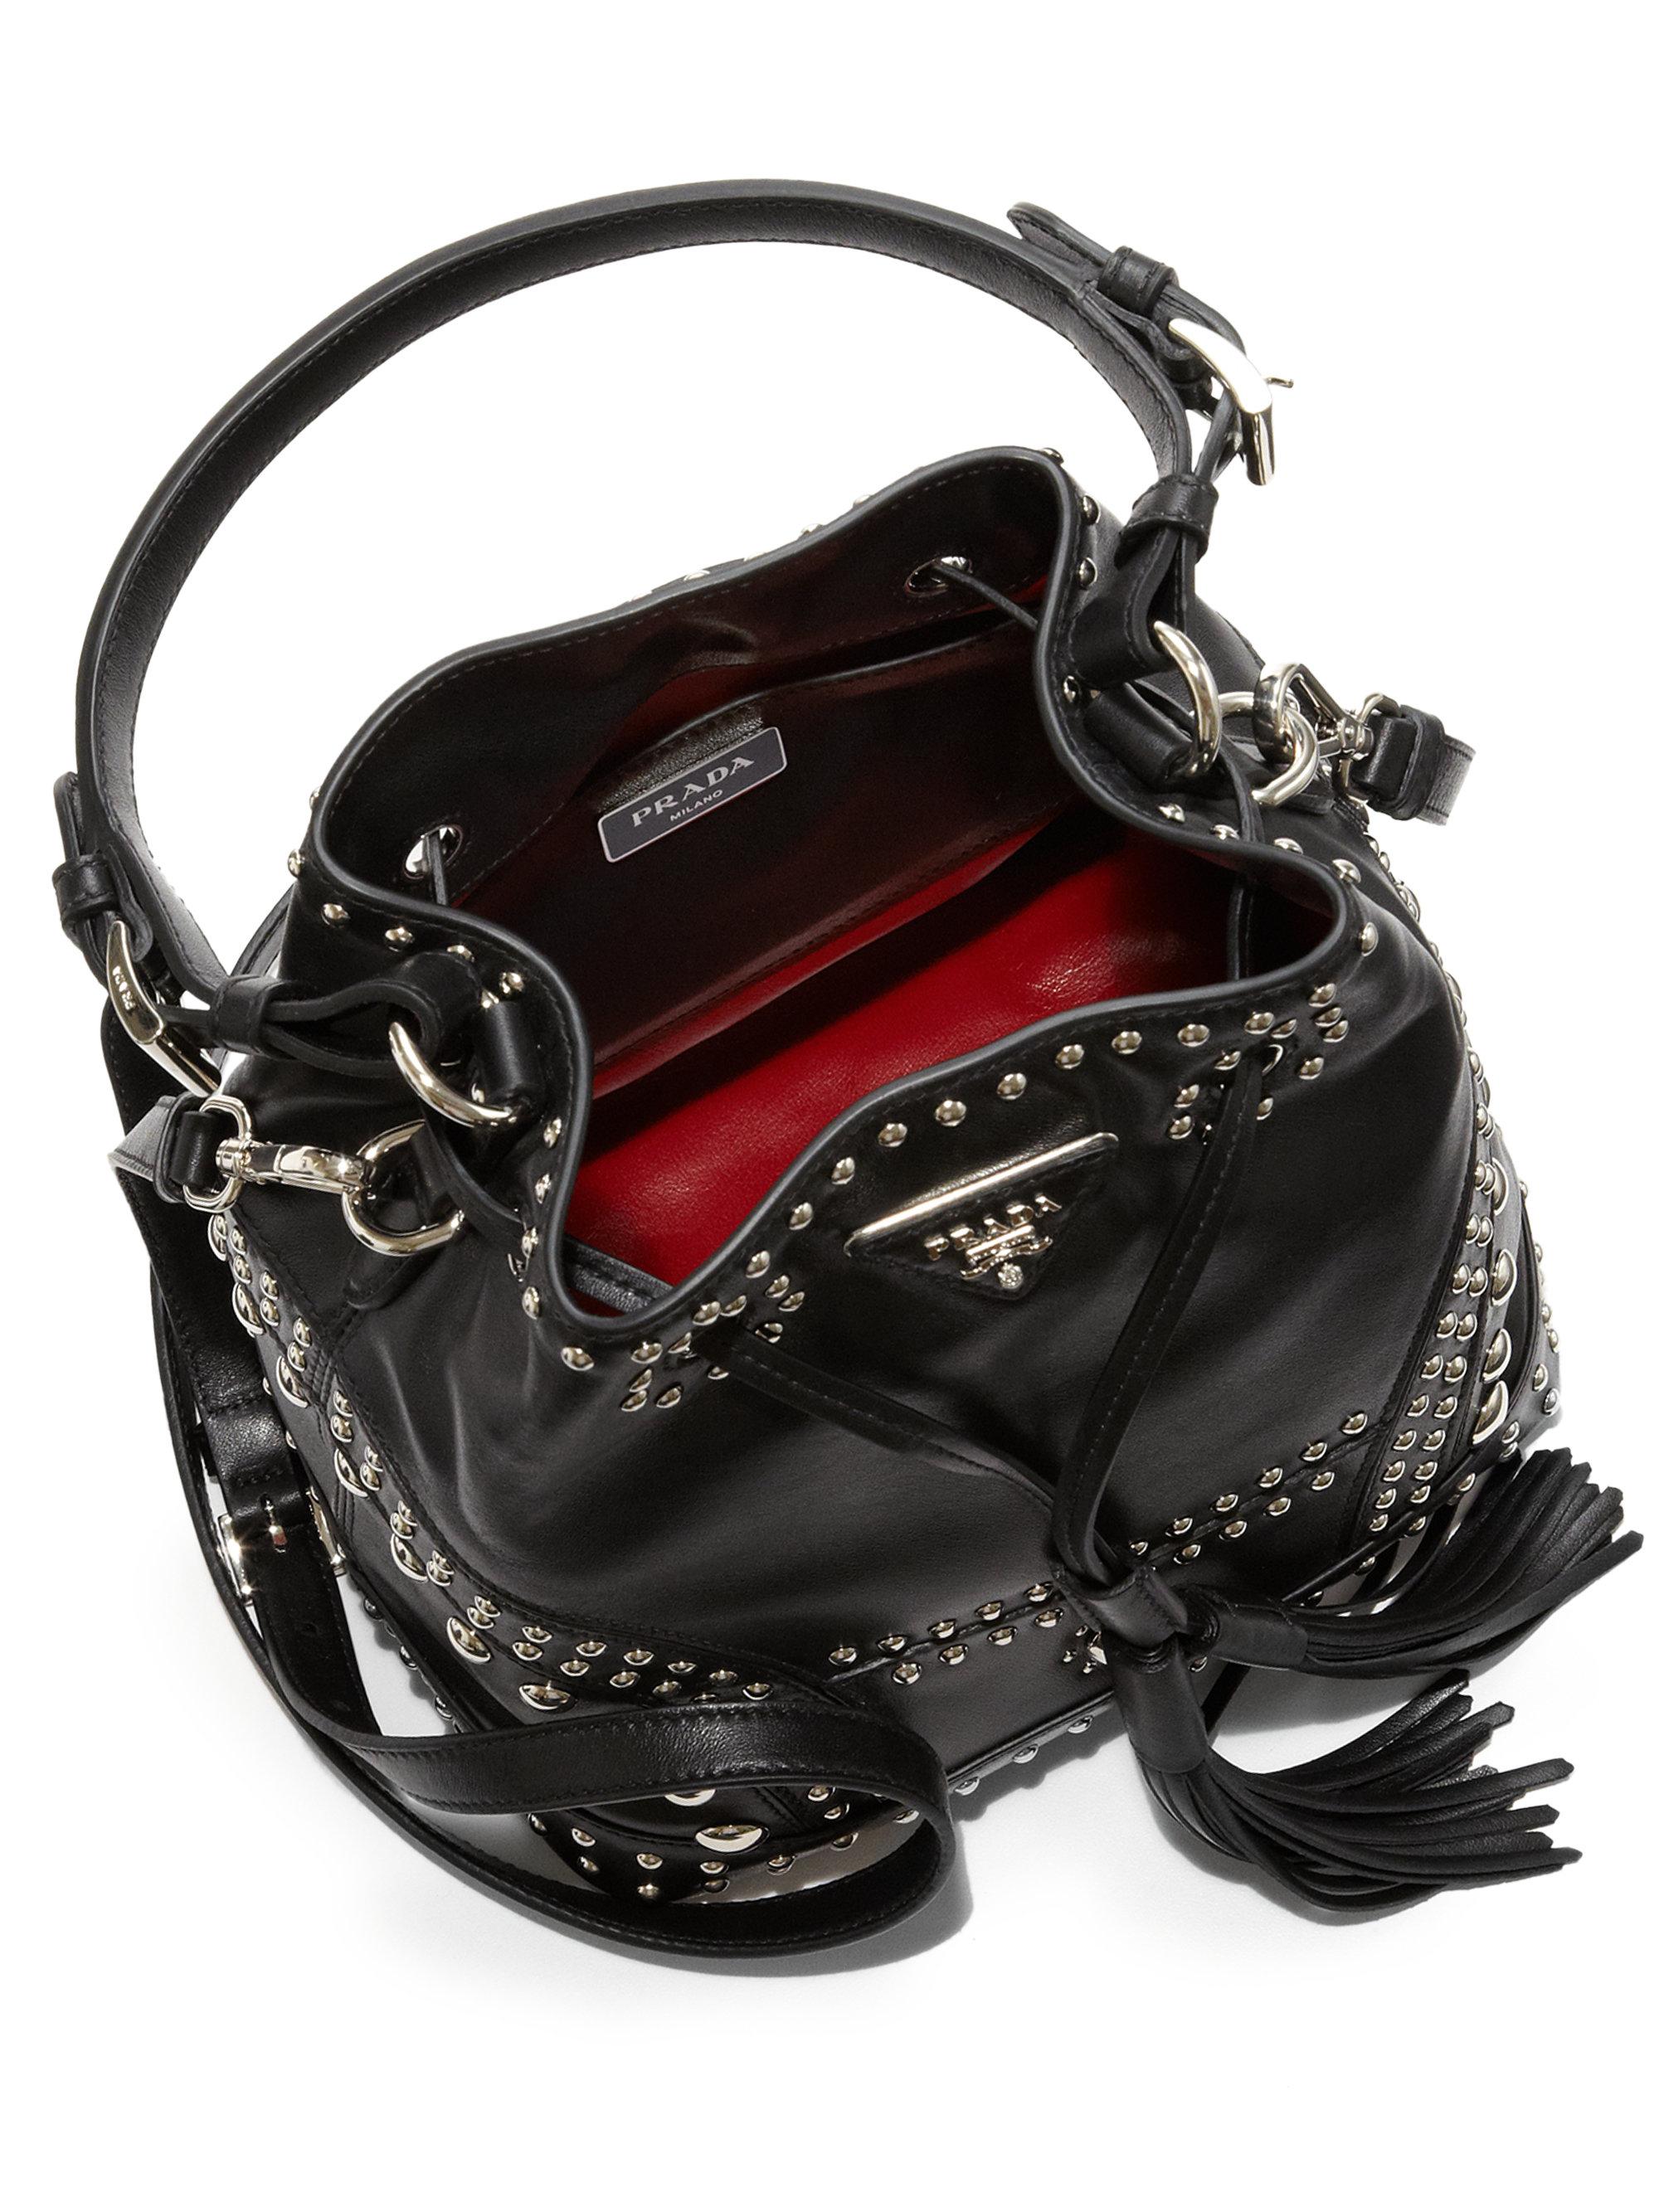 prada lux wallets - Prada Soft Calf Studded Small Bucket Bag in Black (NERO-BLACK) | Lyst